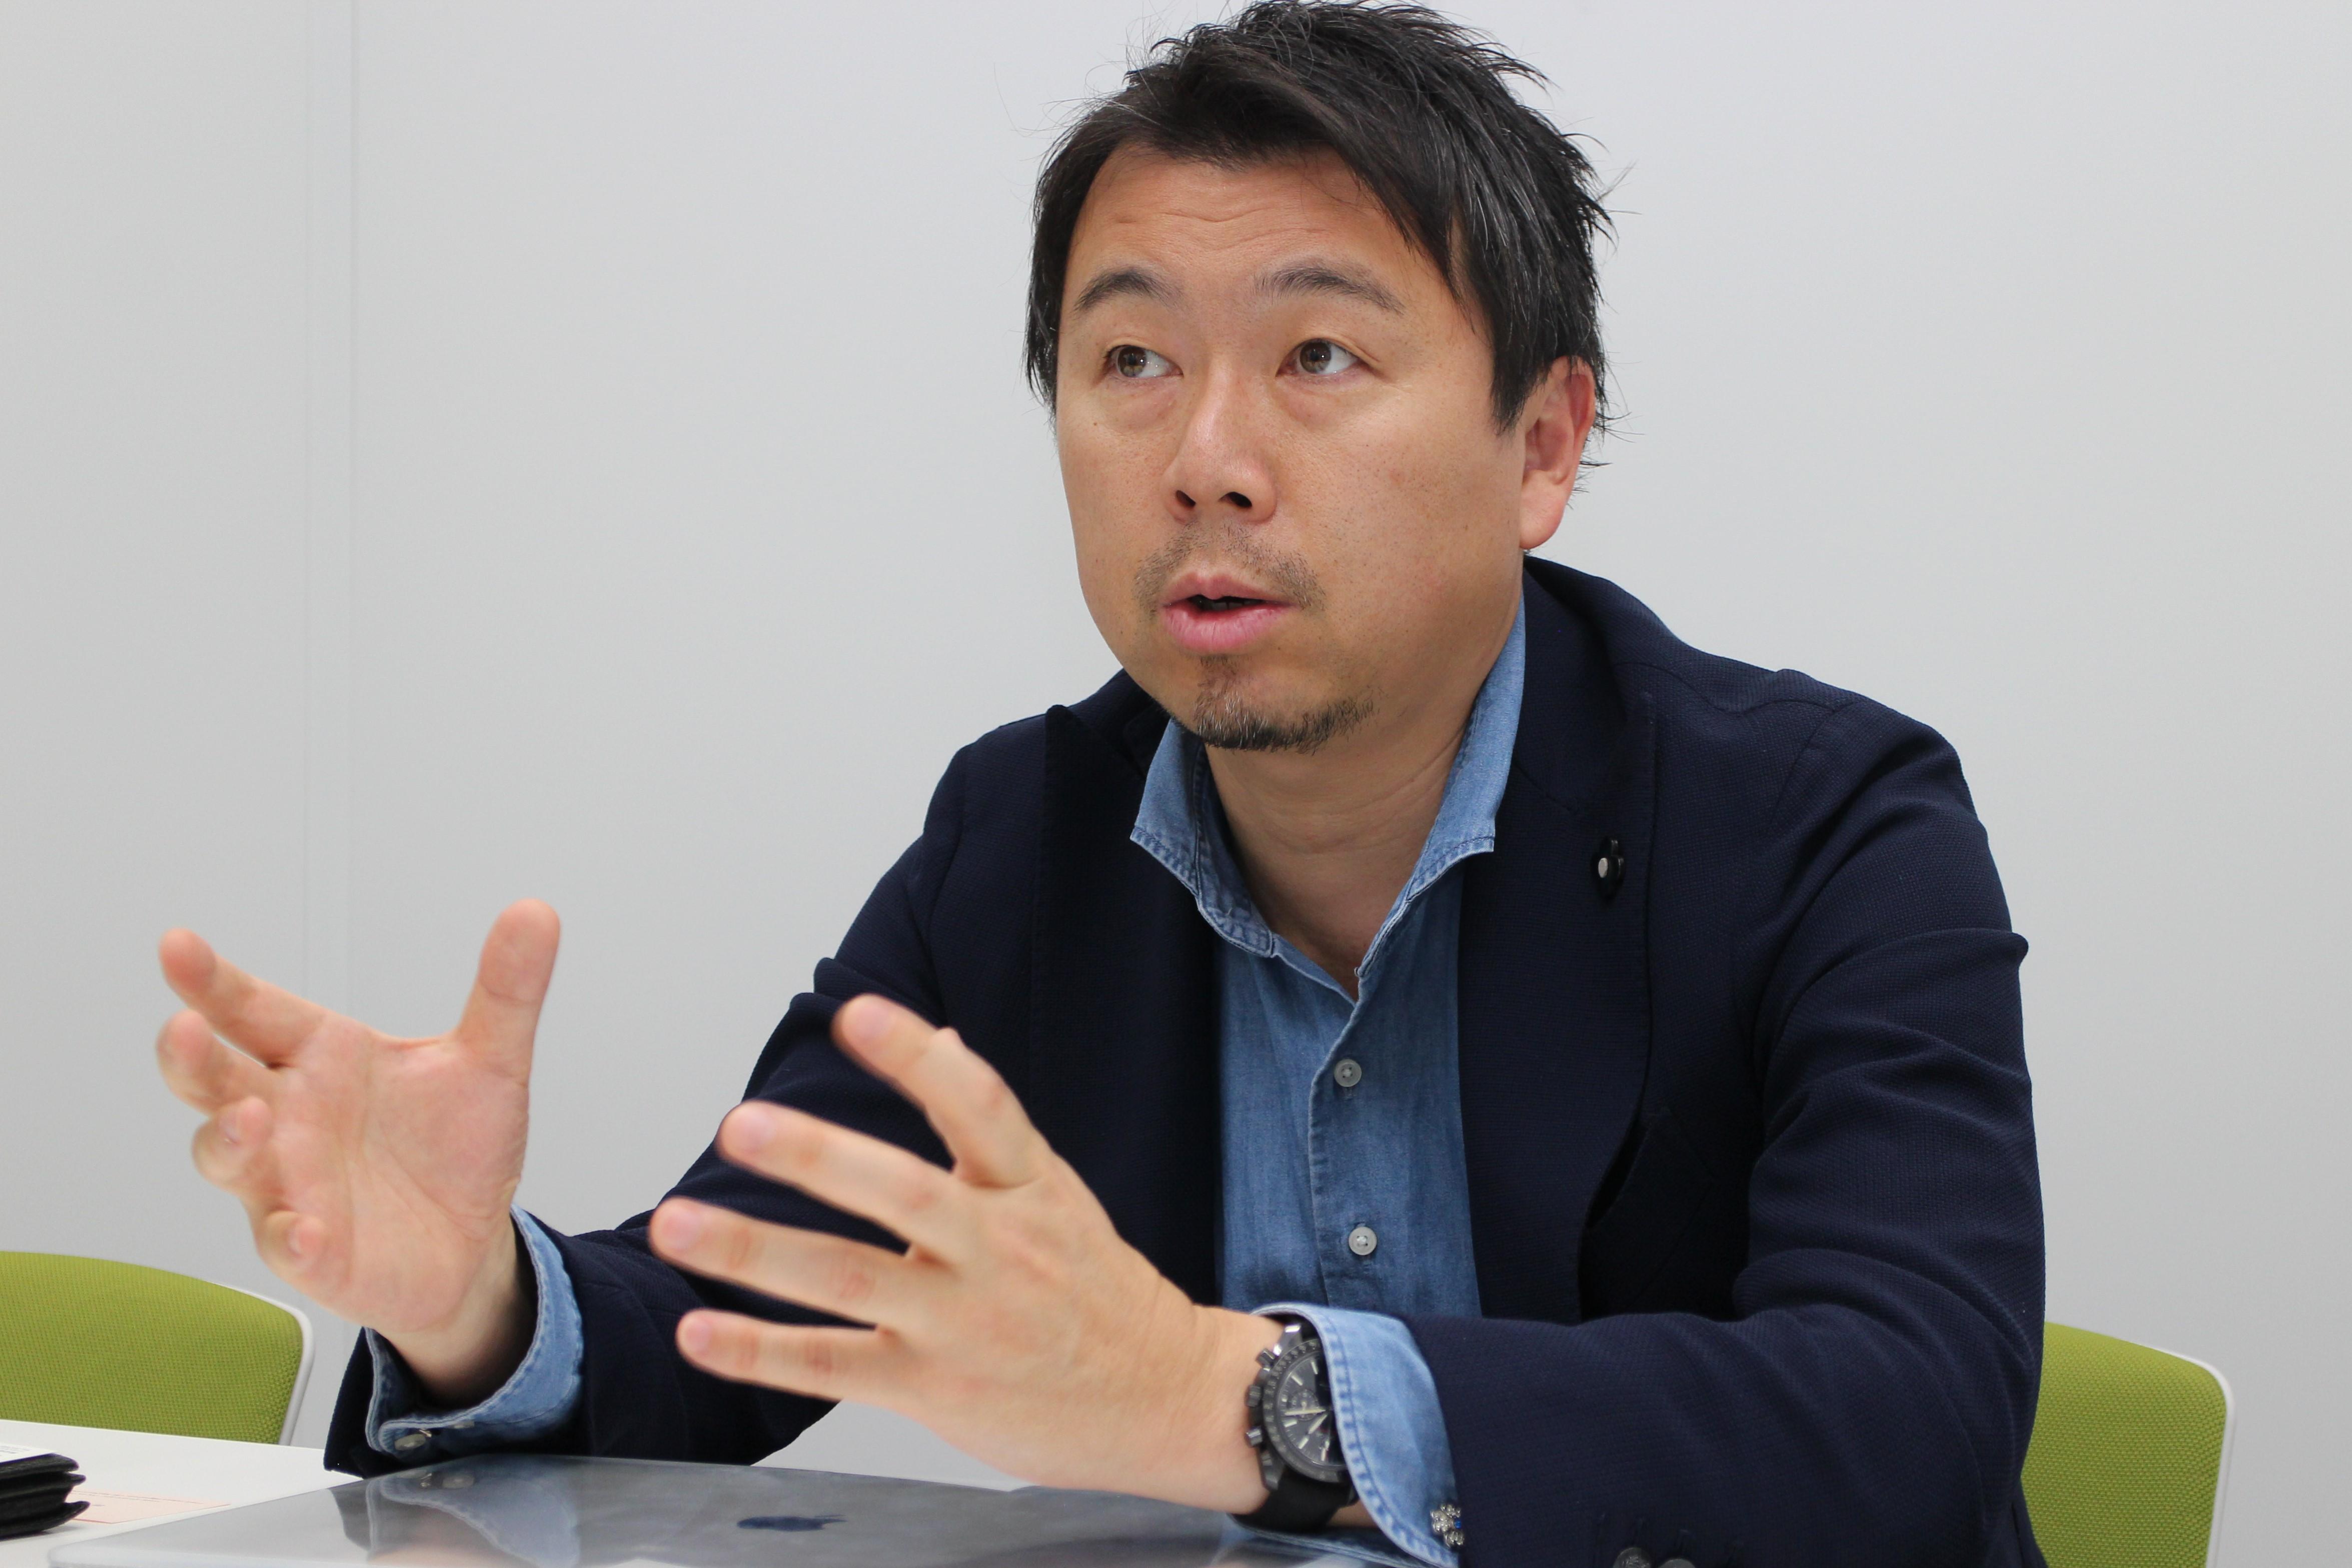 https://ict-enews.net/wp-content/uploads/2018/06/SBCS-1.jpg